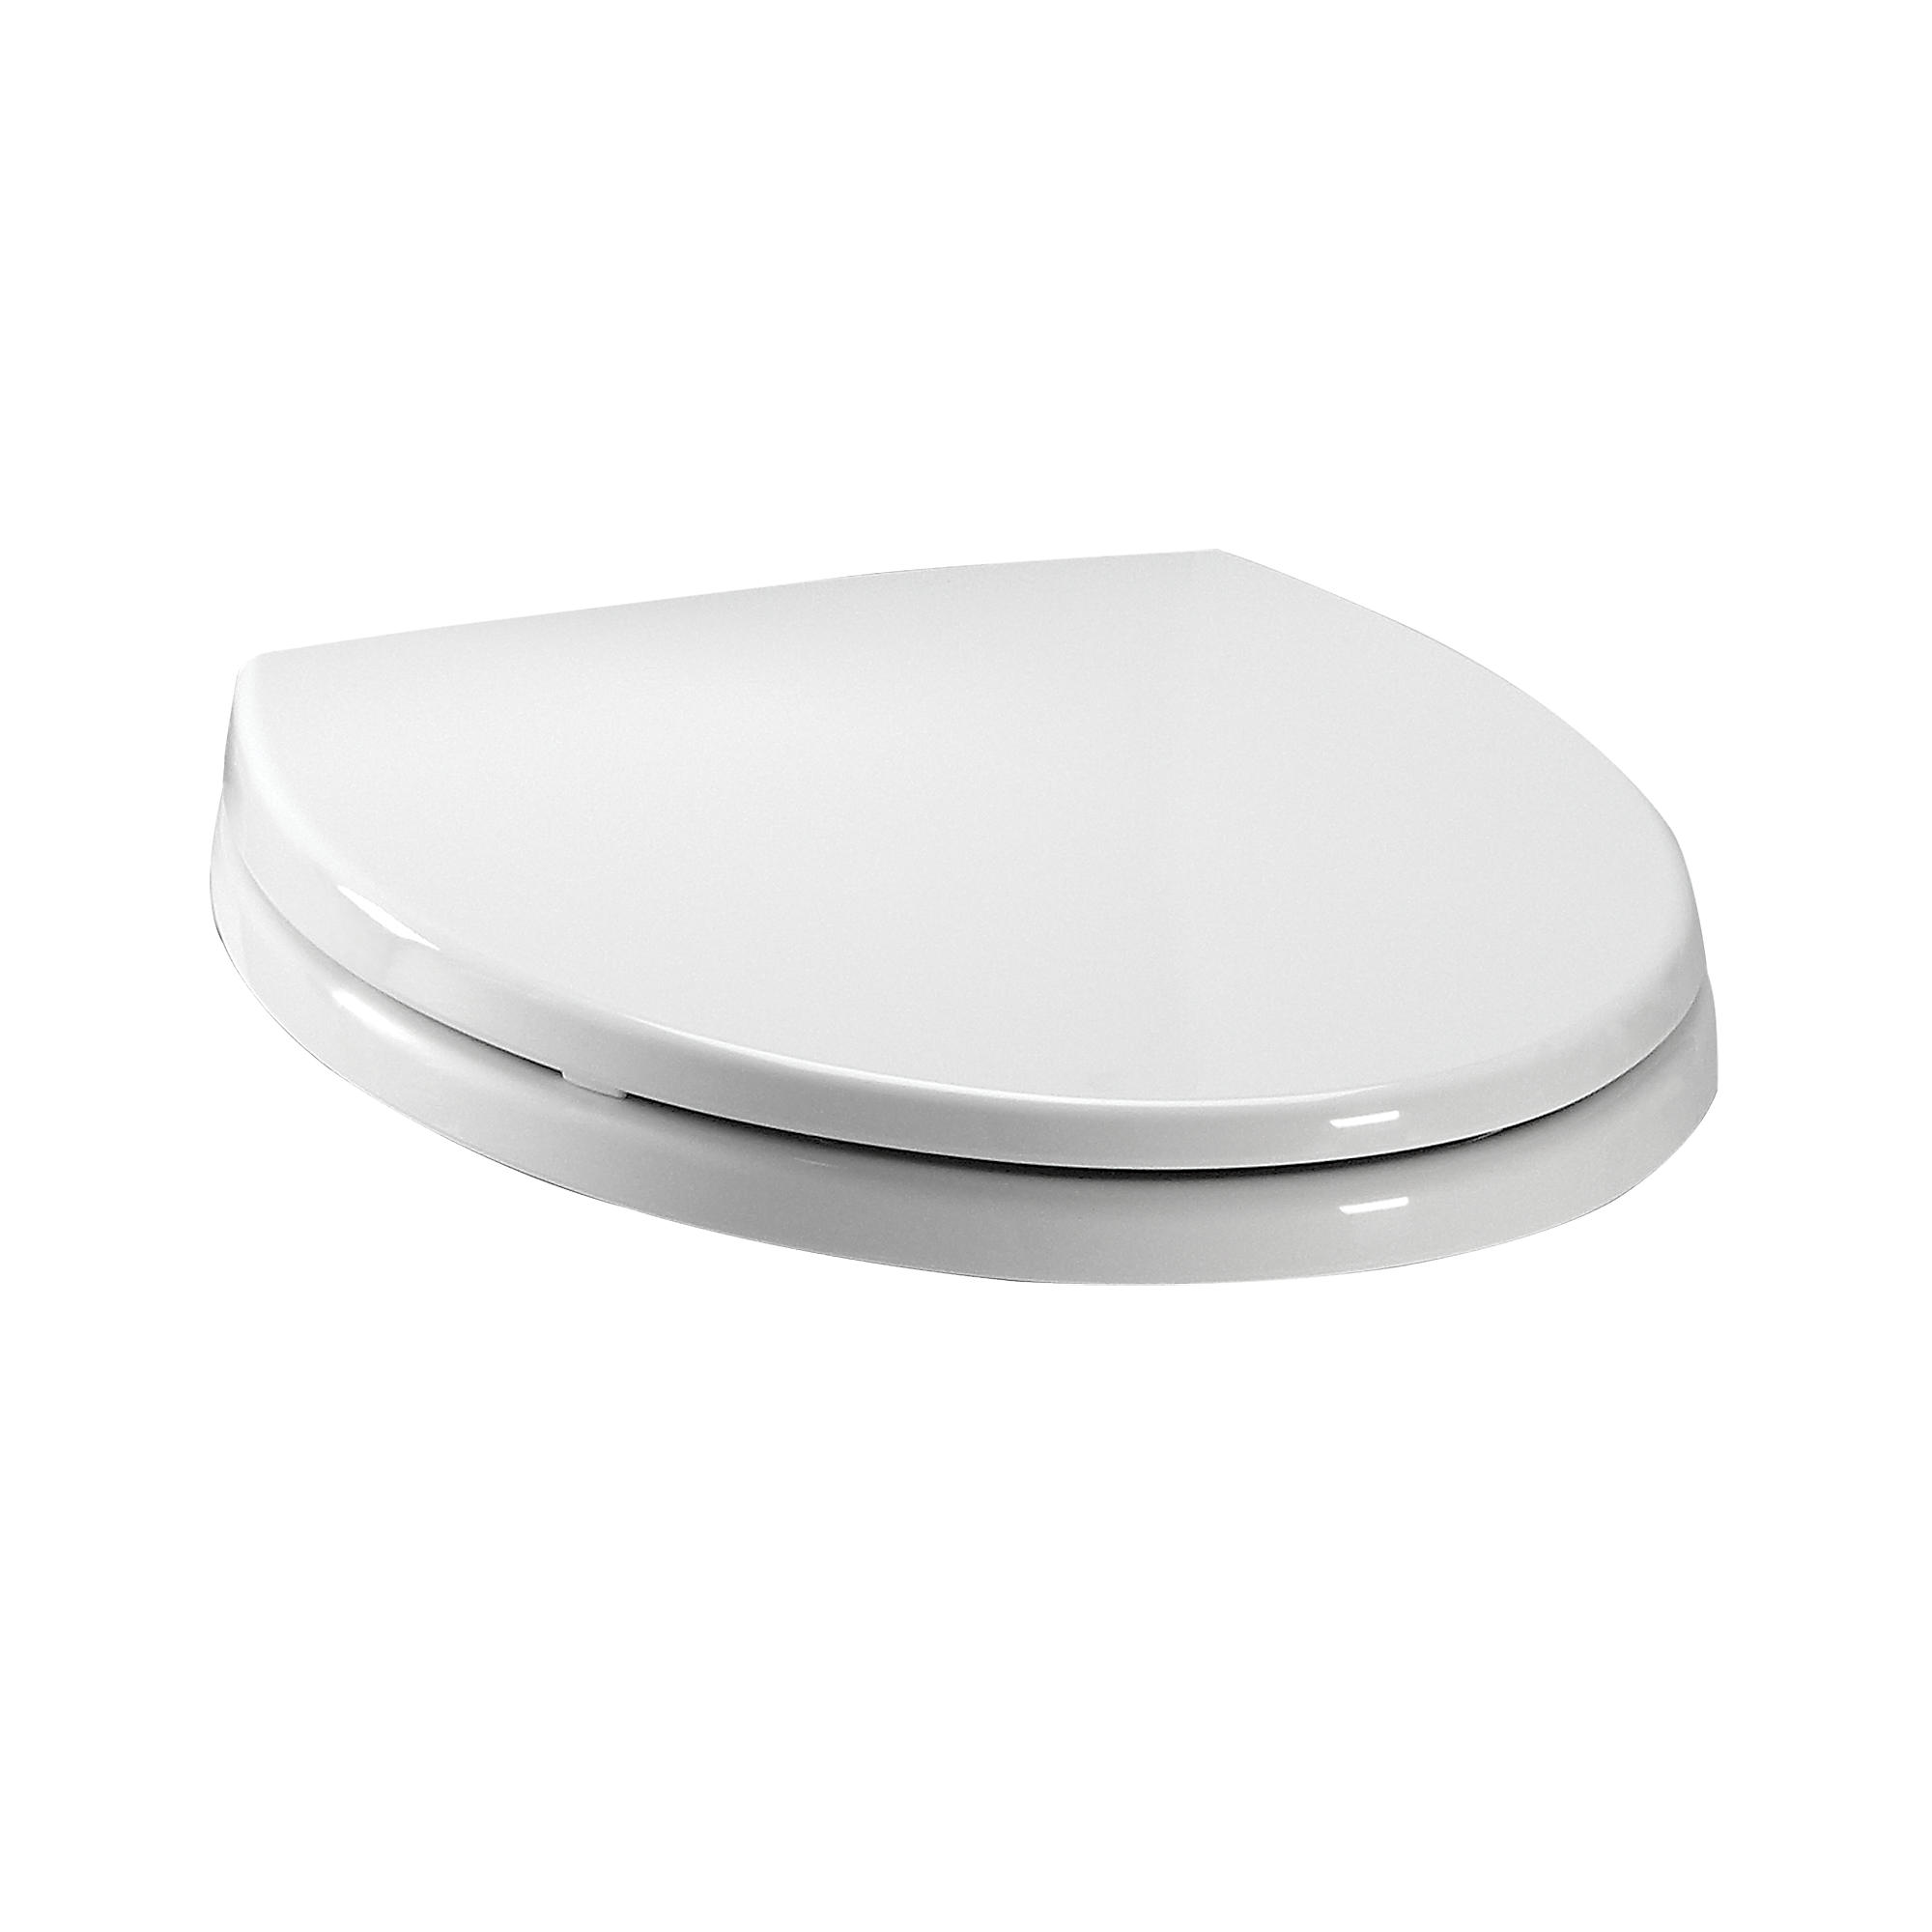 Ss113 01 softclose  toilet seat   round 0